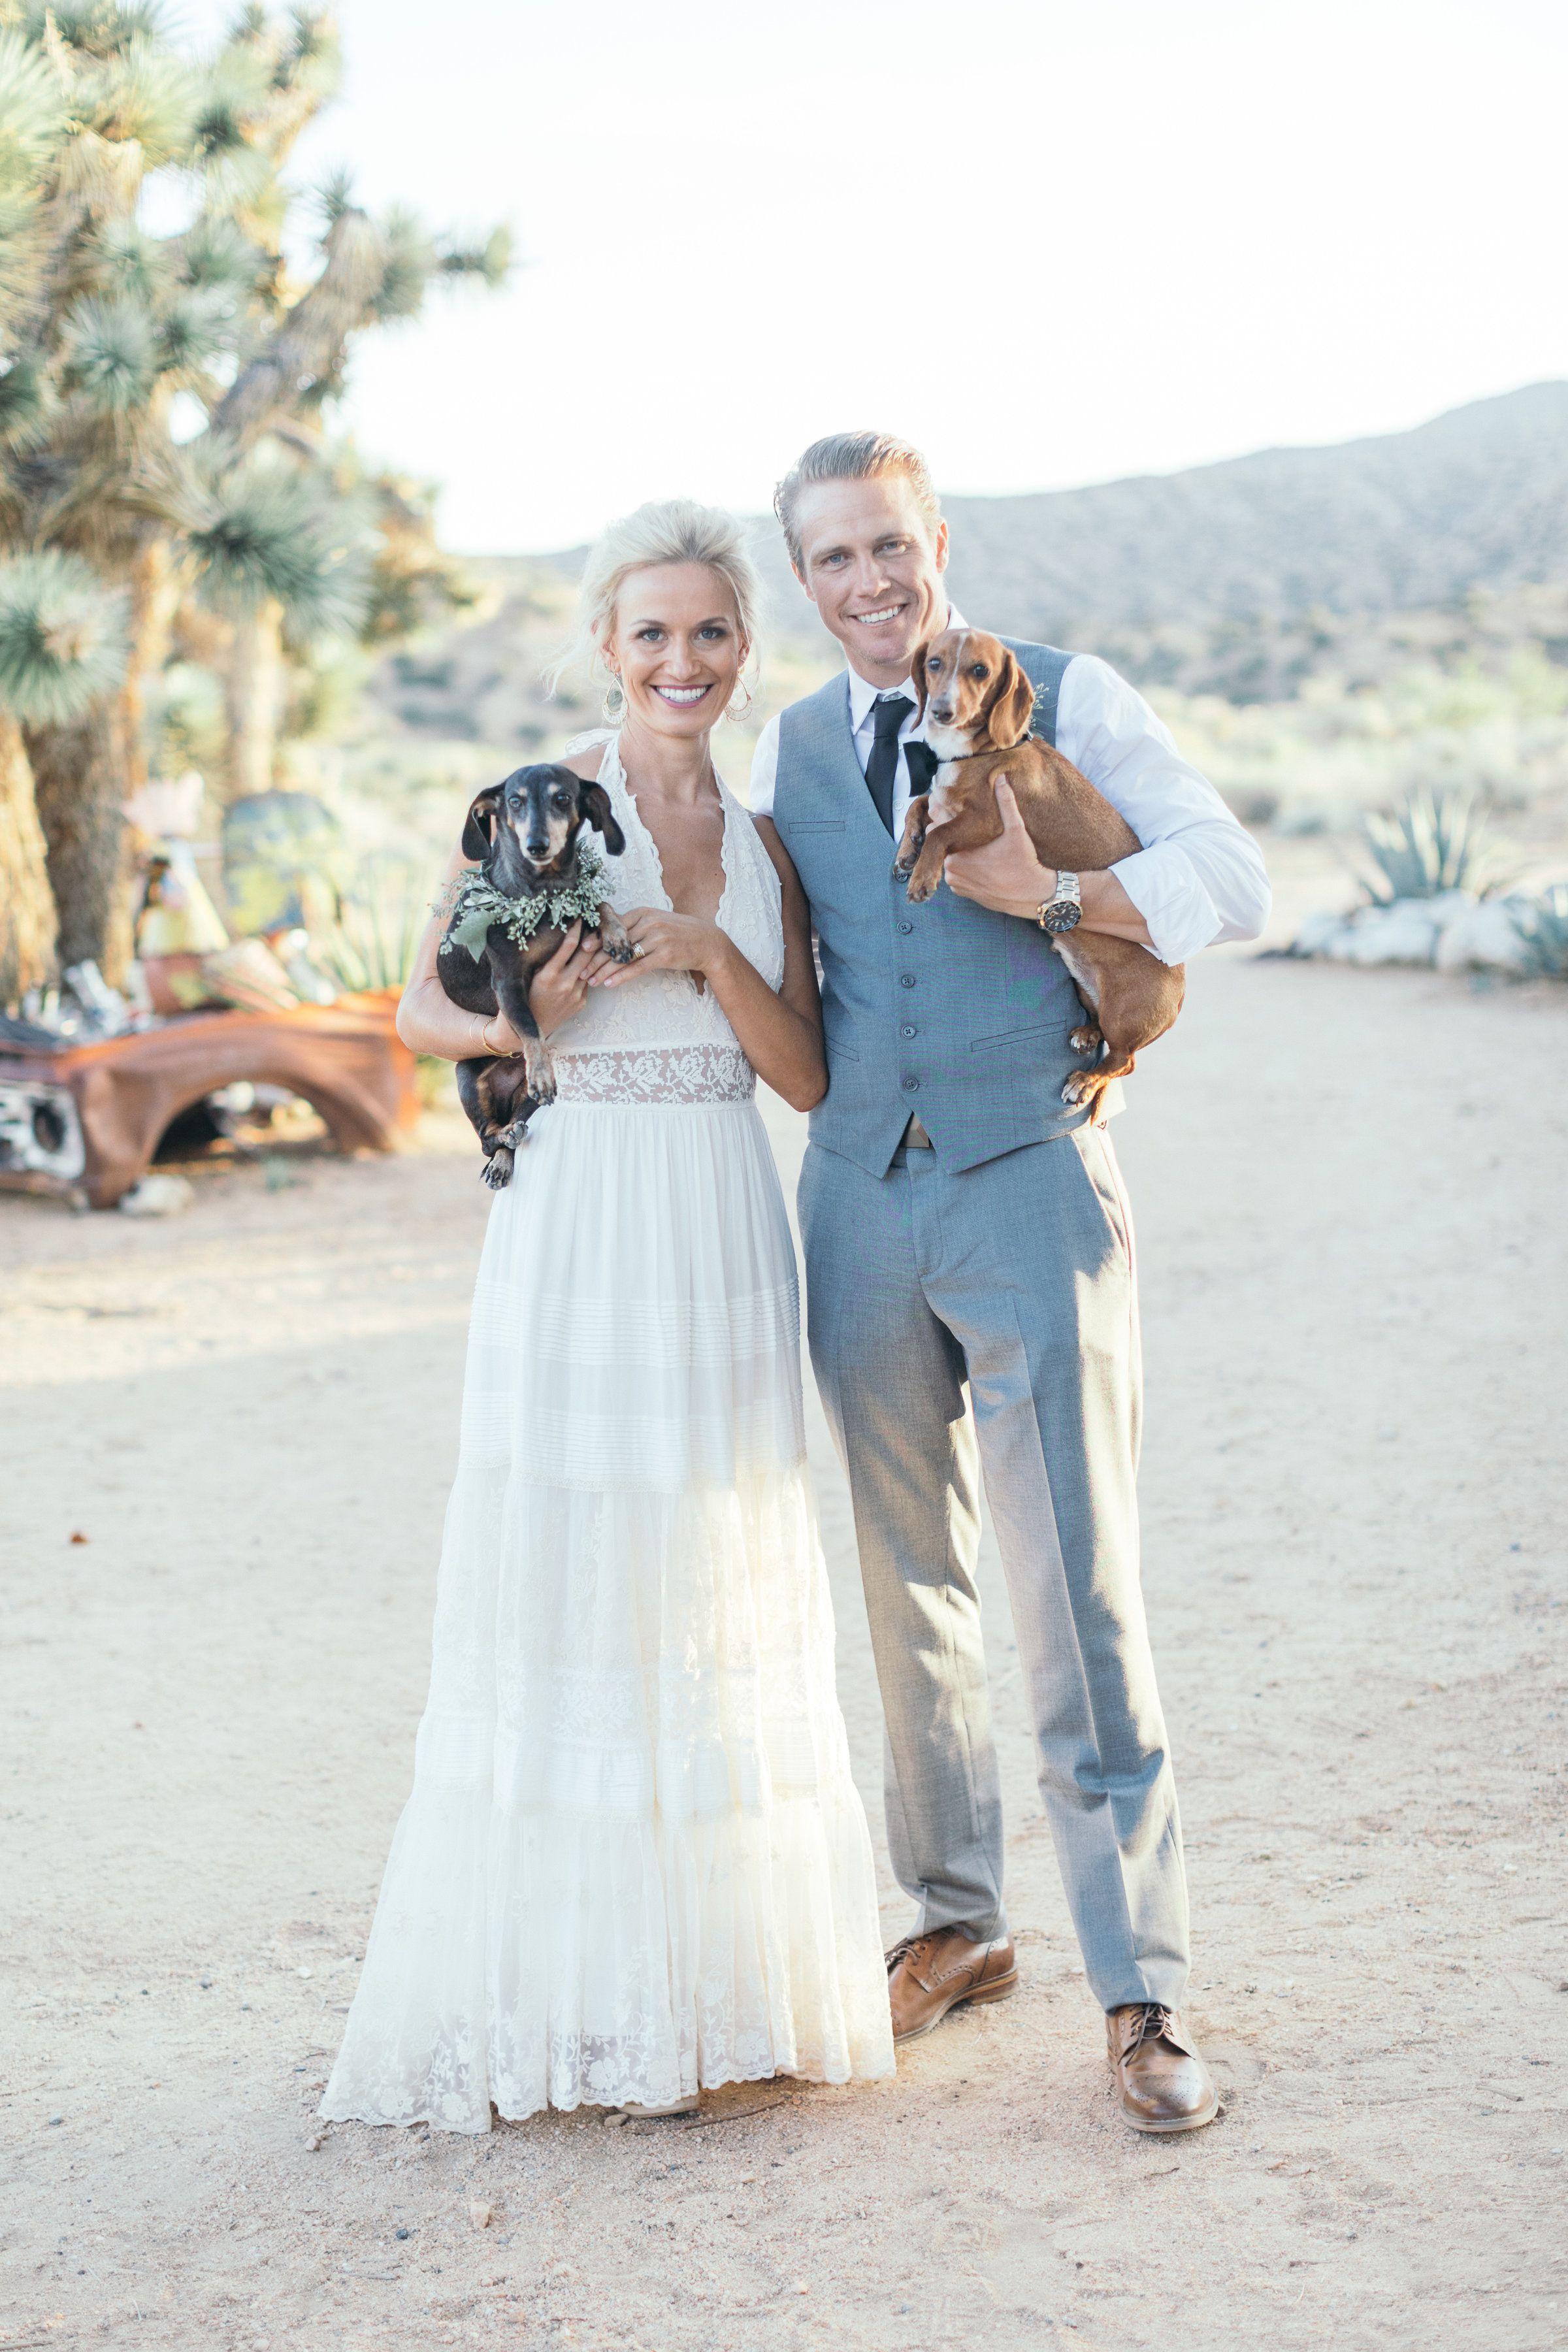 Boho Bride in Angelica Halter Gown, Dachshund dogs ...